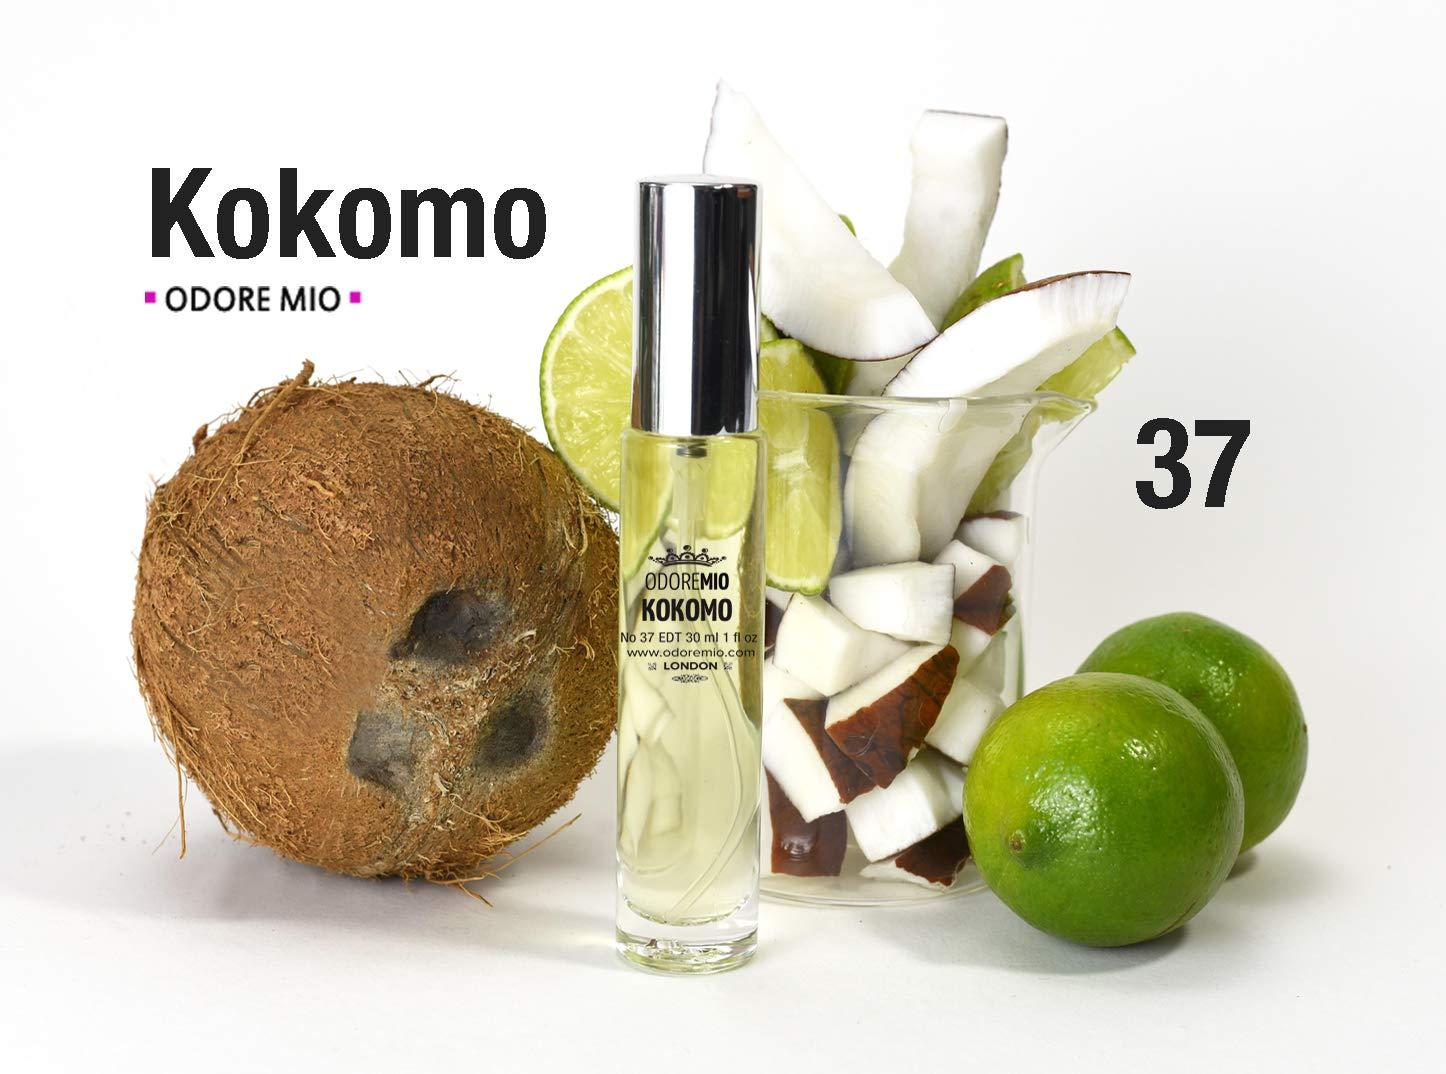 Odore Mio Kokomo Eau de Cologne 3 ml Sample